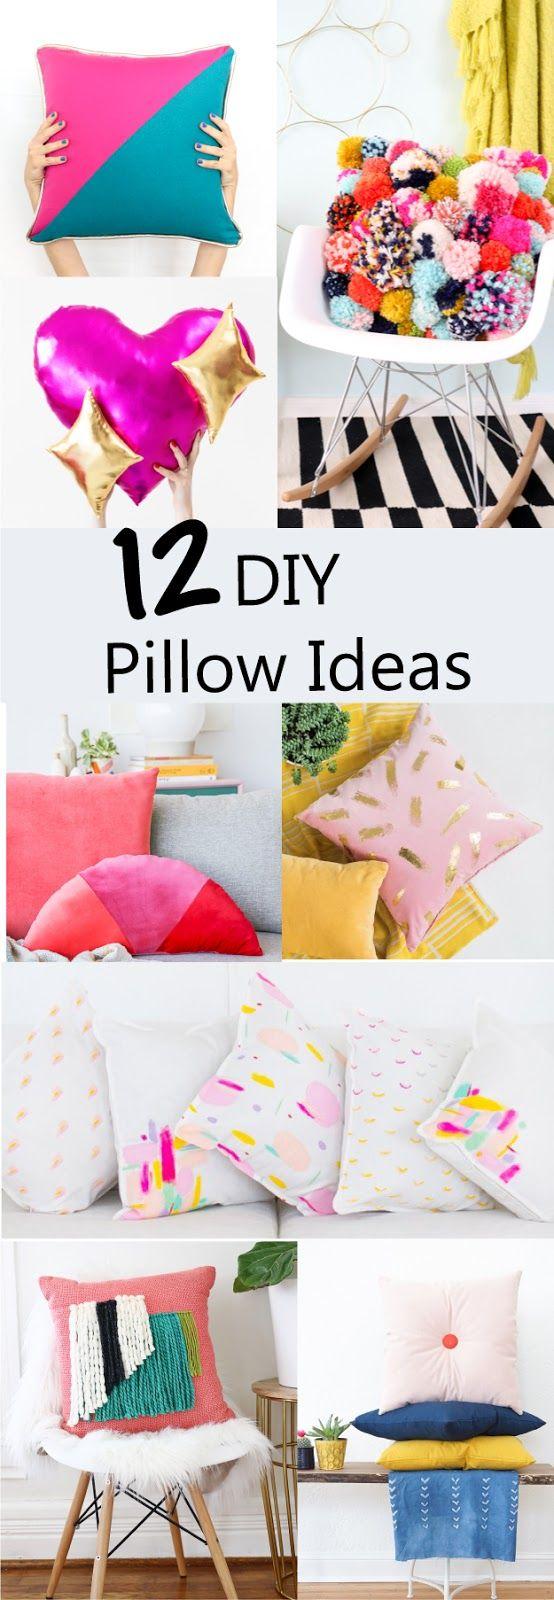 12 DIY Throw Pillow Ideas - How to sew a pillow - trendy modern pillows - home decor - pom poms - velvet - woven - emoji - pretzel - abstract art - craft - sewing tutorial